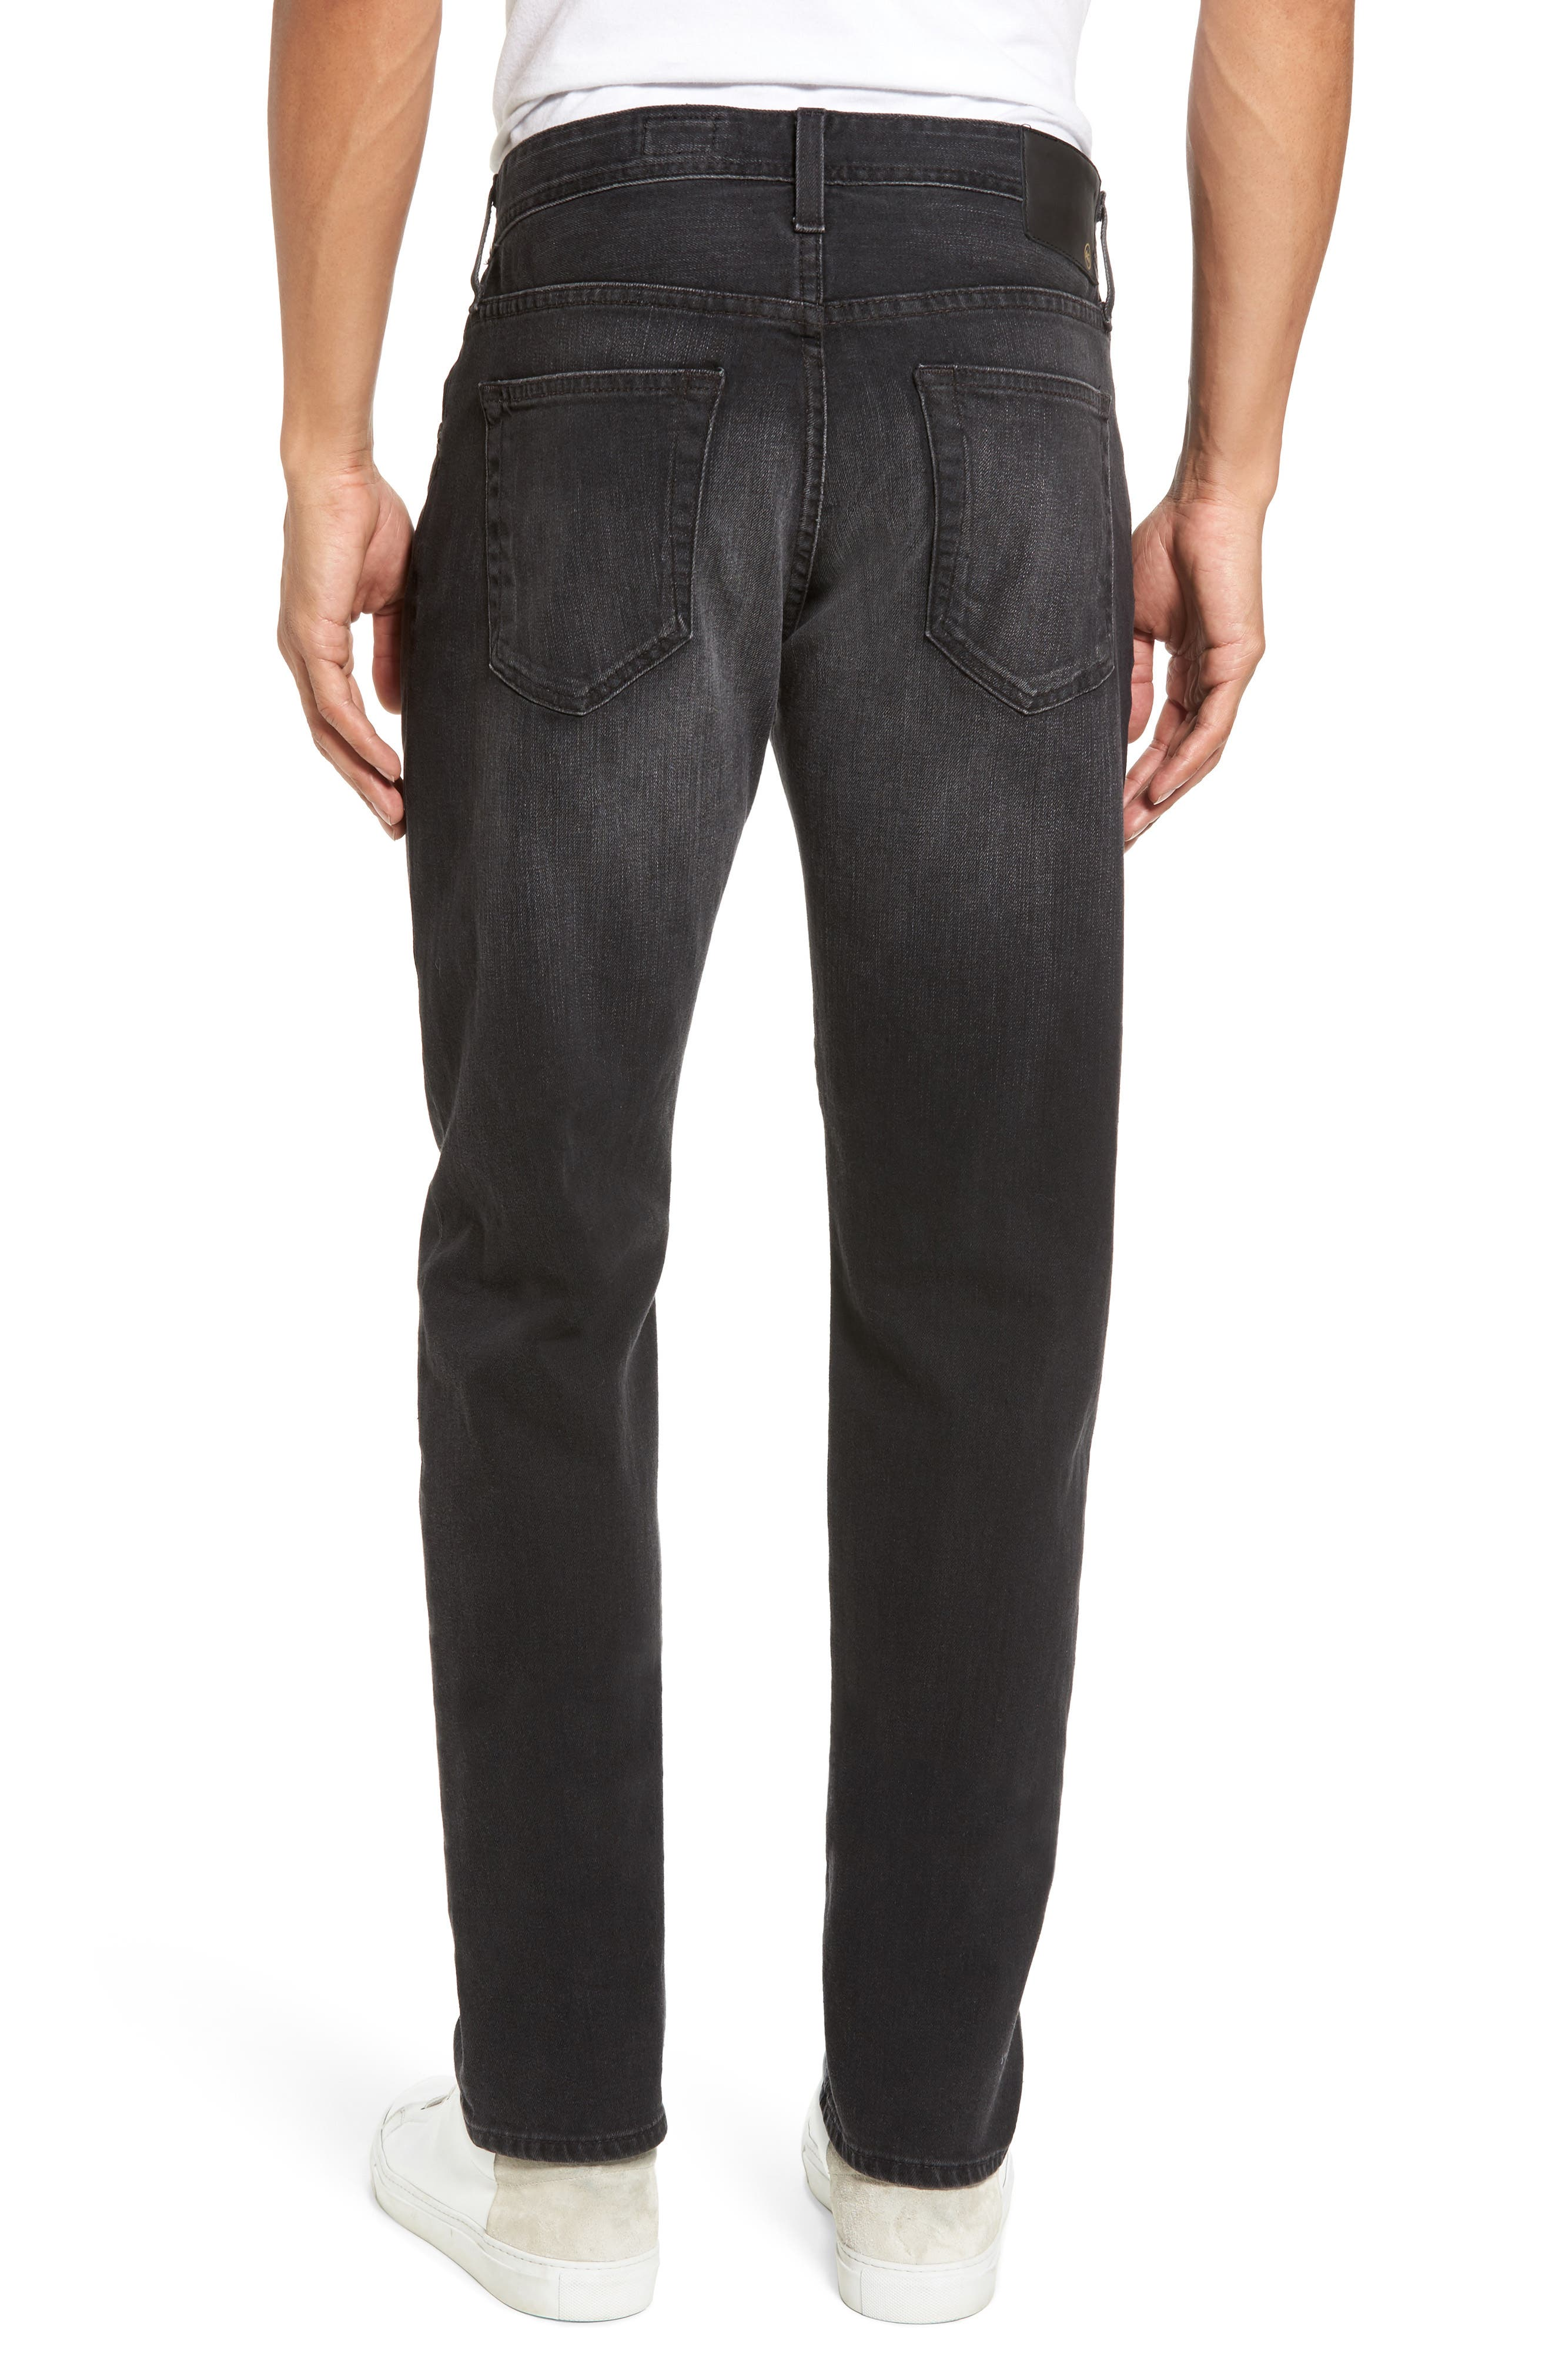 Tellis Modern Slim Fit Jeans,                             Alternate thumbnail 2, color,                             019